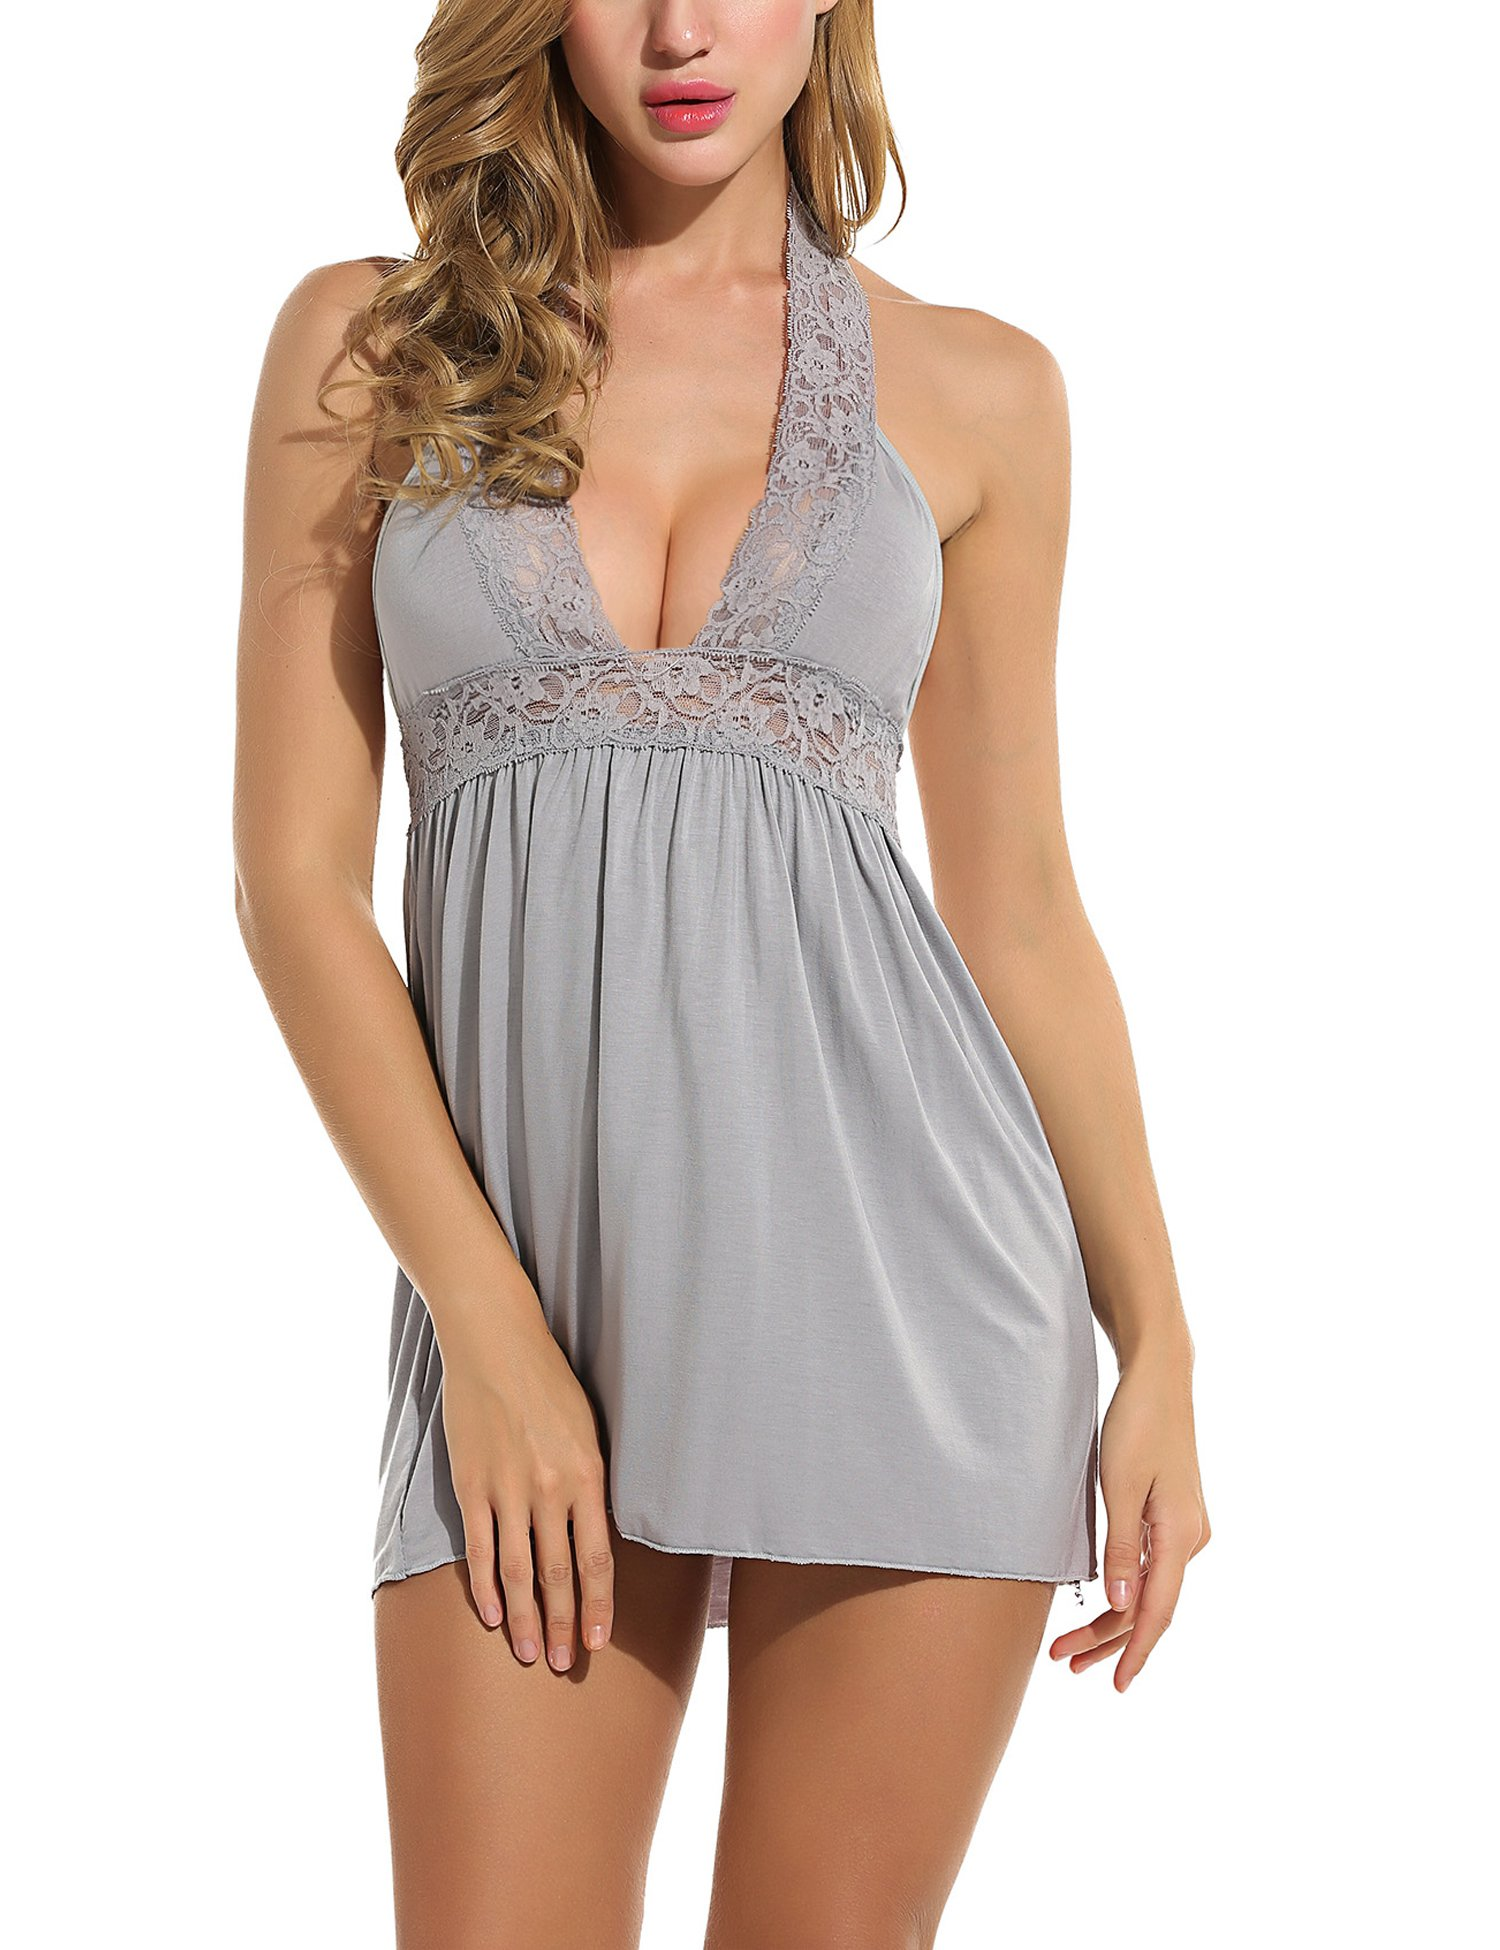 ADOME Women Sleepwear Halter Babydoll Lingerie Lace Chemise Nightie Dress,Style 1 Gray,Large